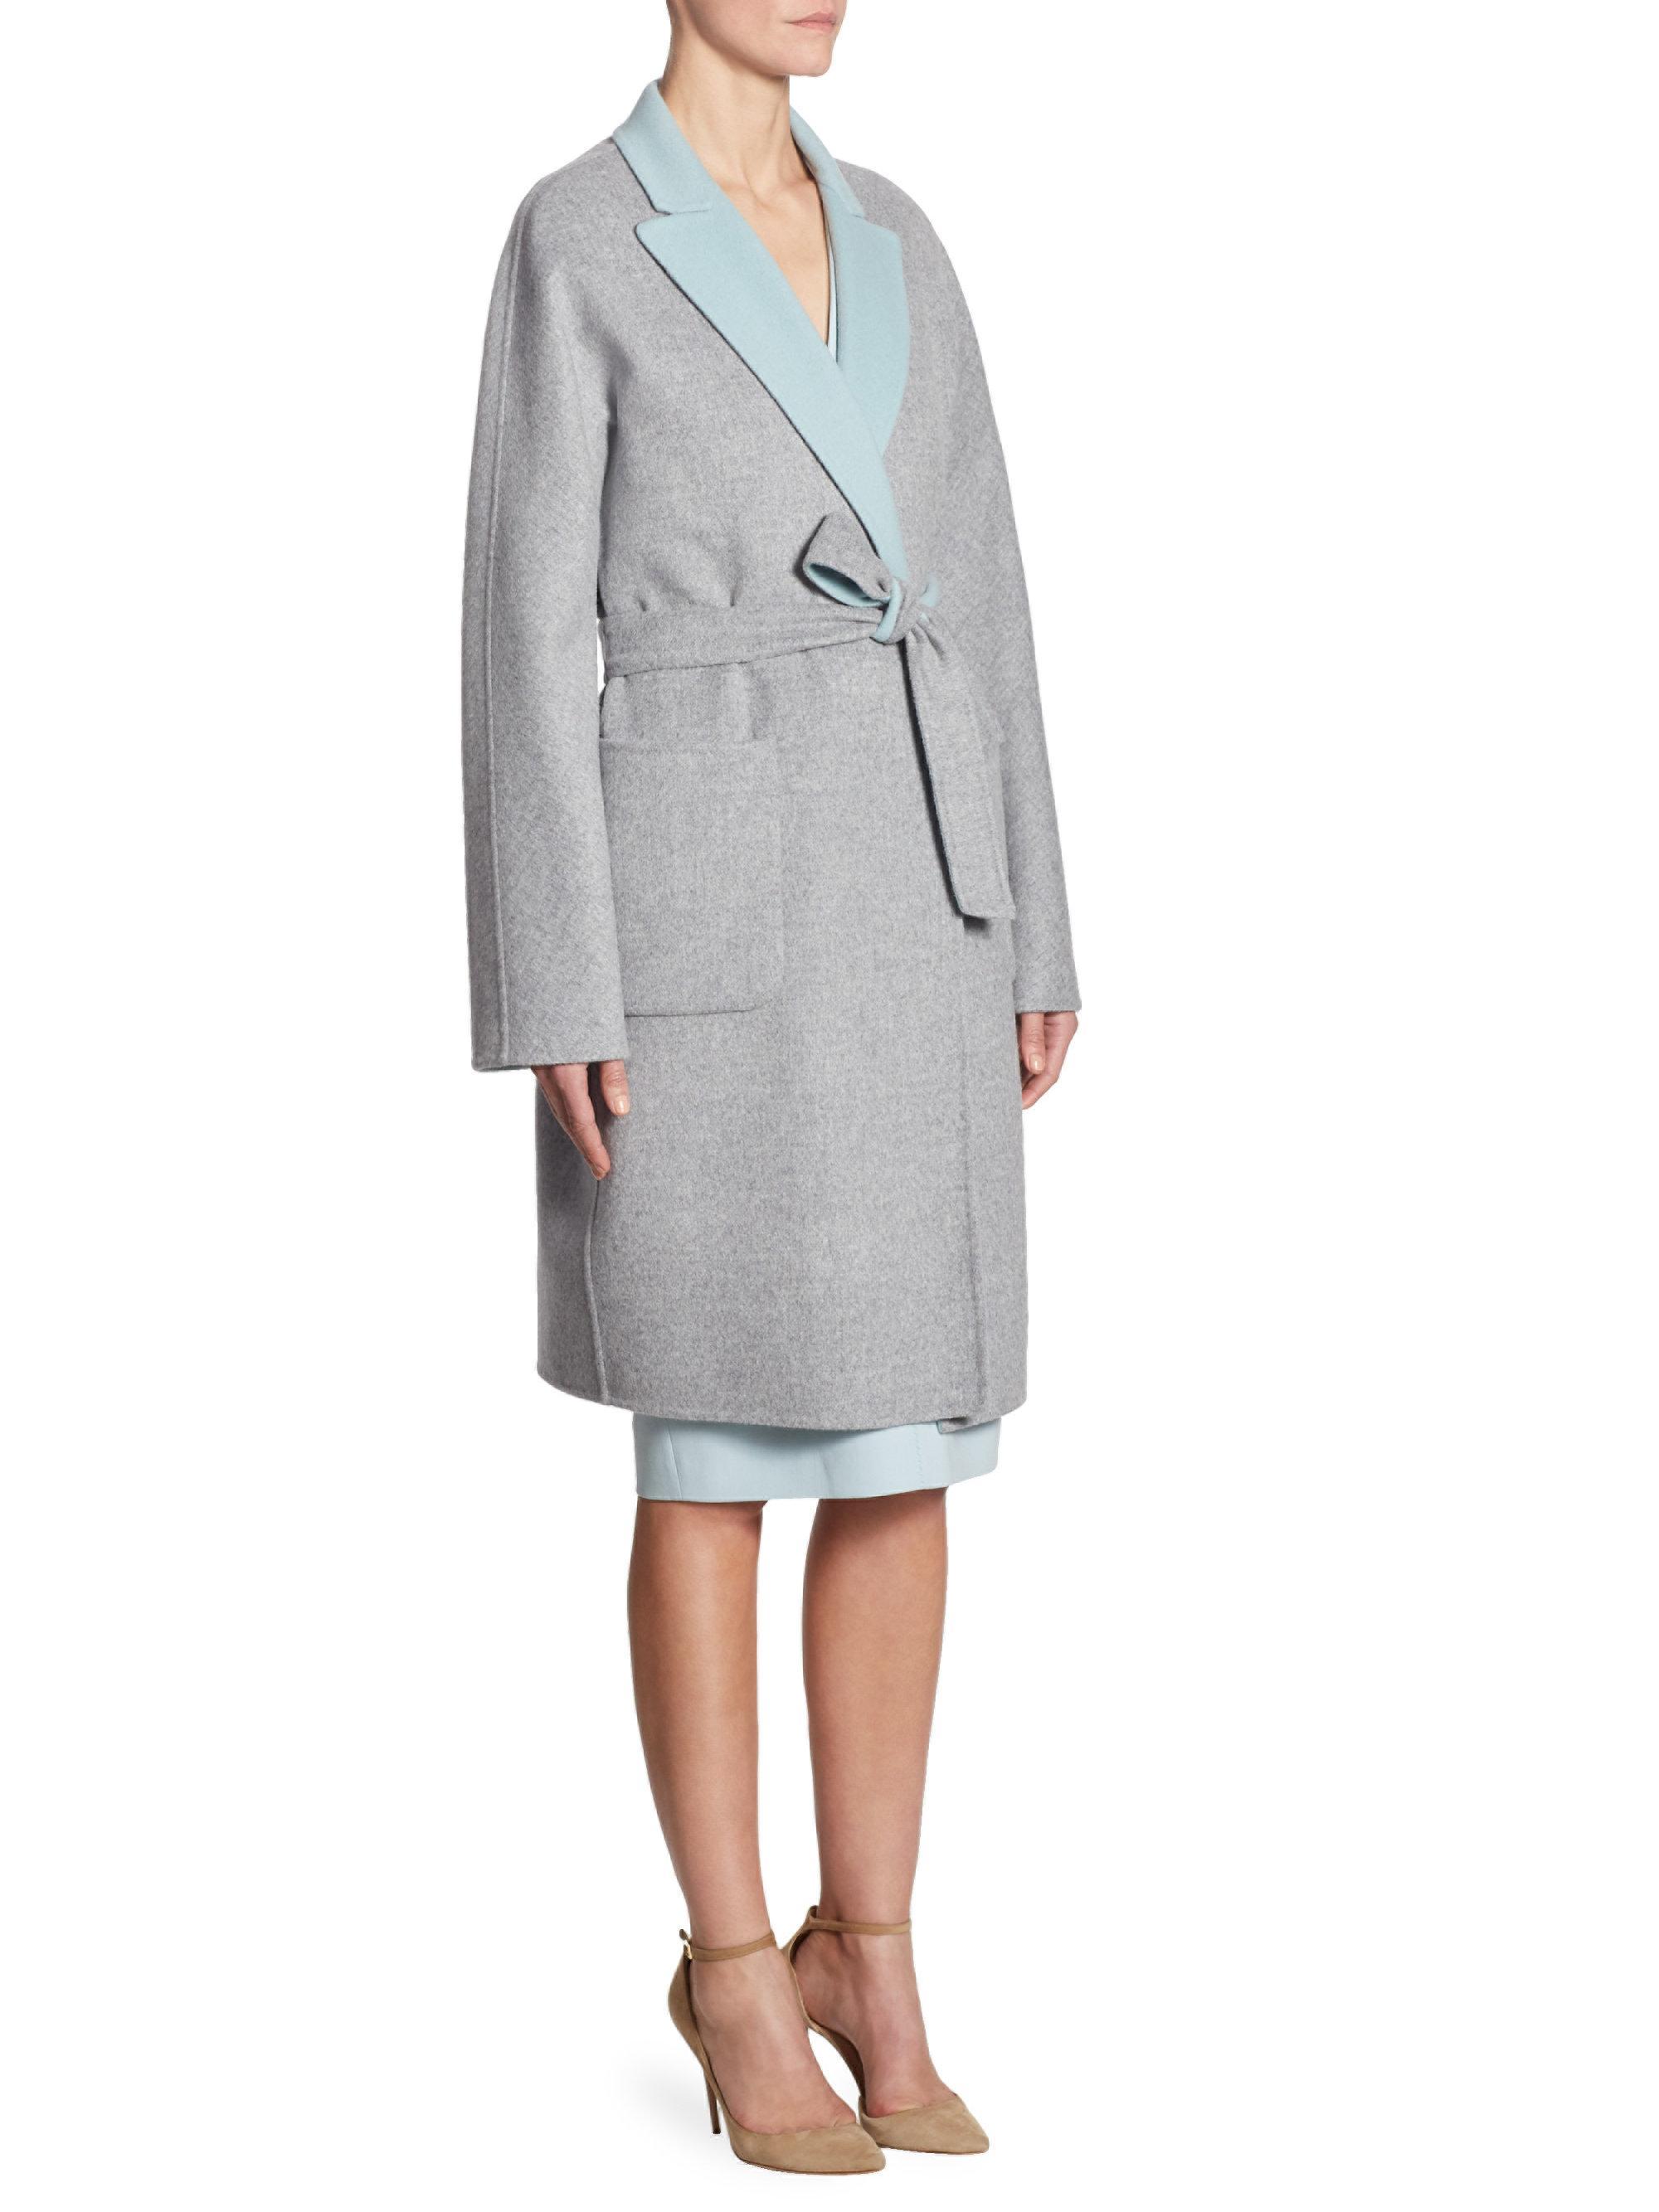 Lyst - Max Mara Rouen Virgin Wool   Angora Reversible Coat in Blue a8d4e77e399